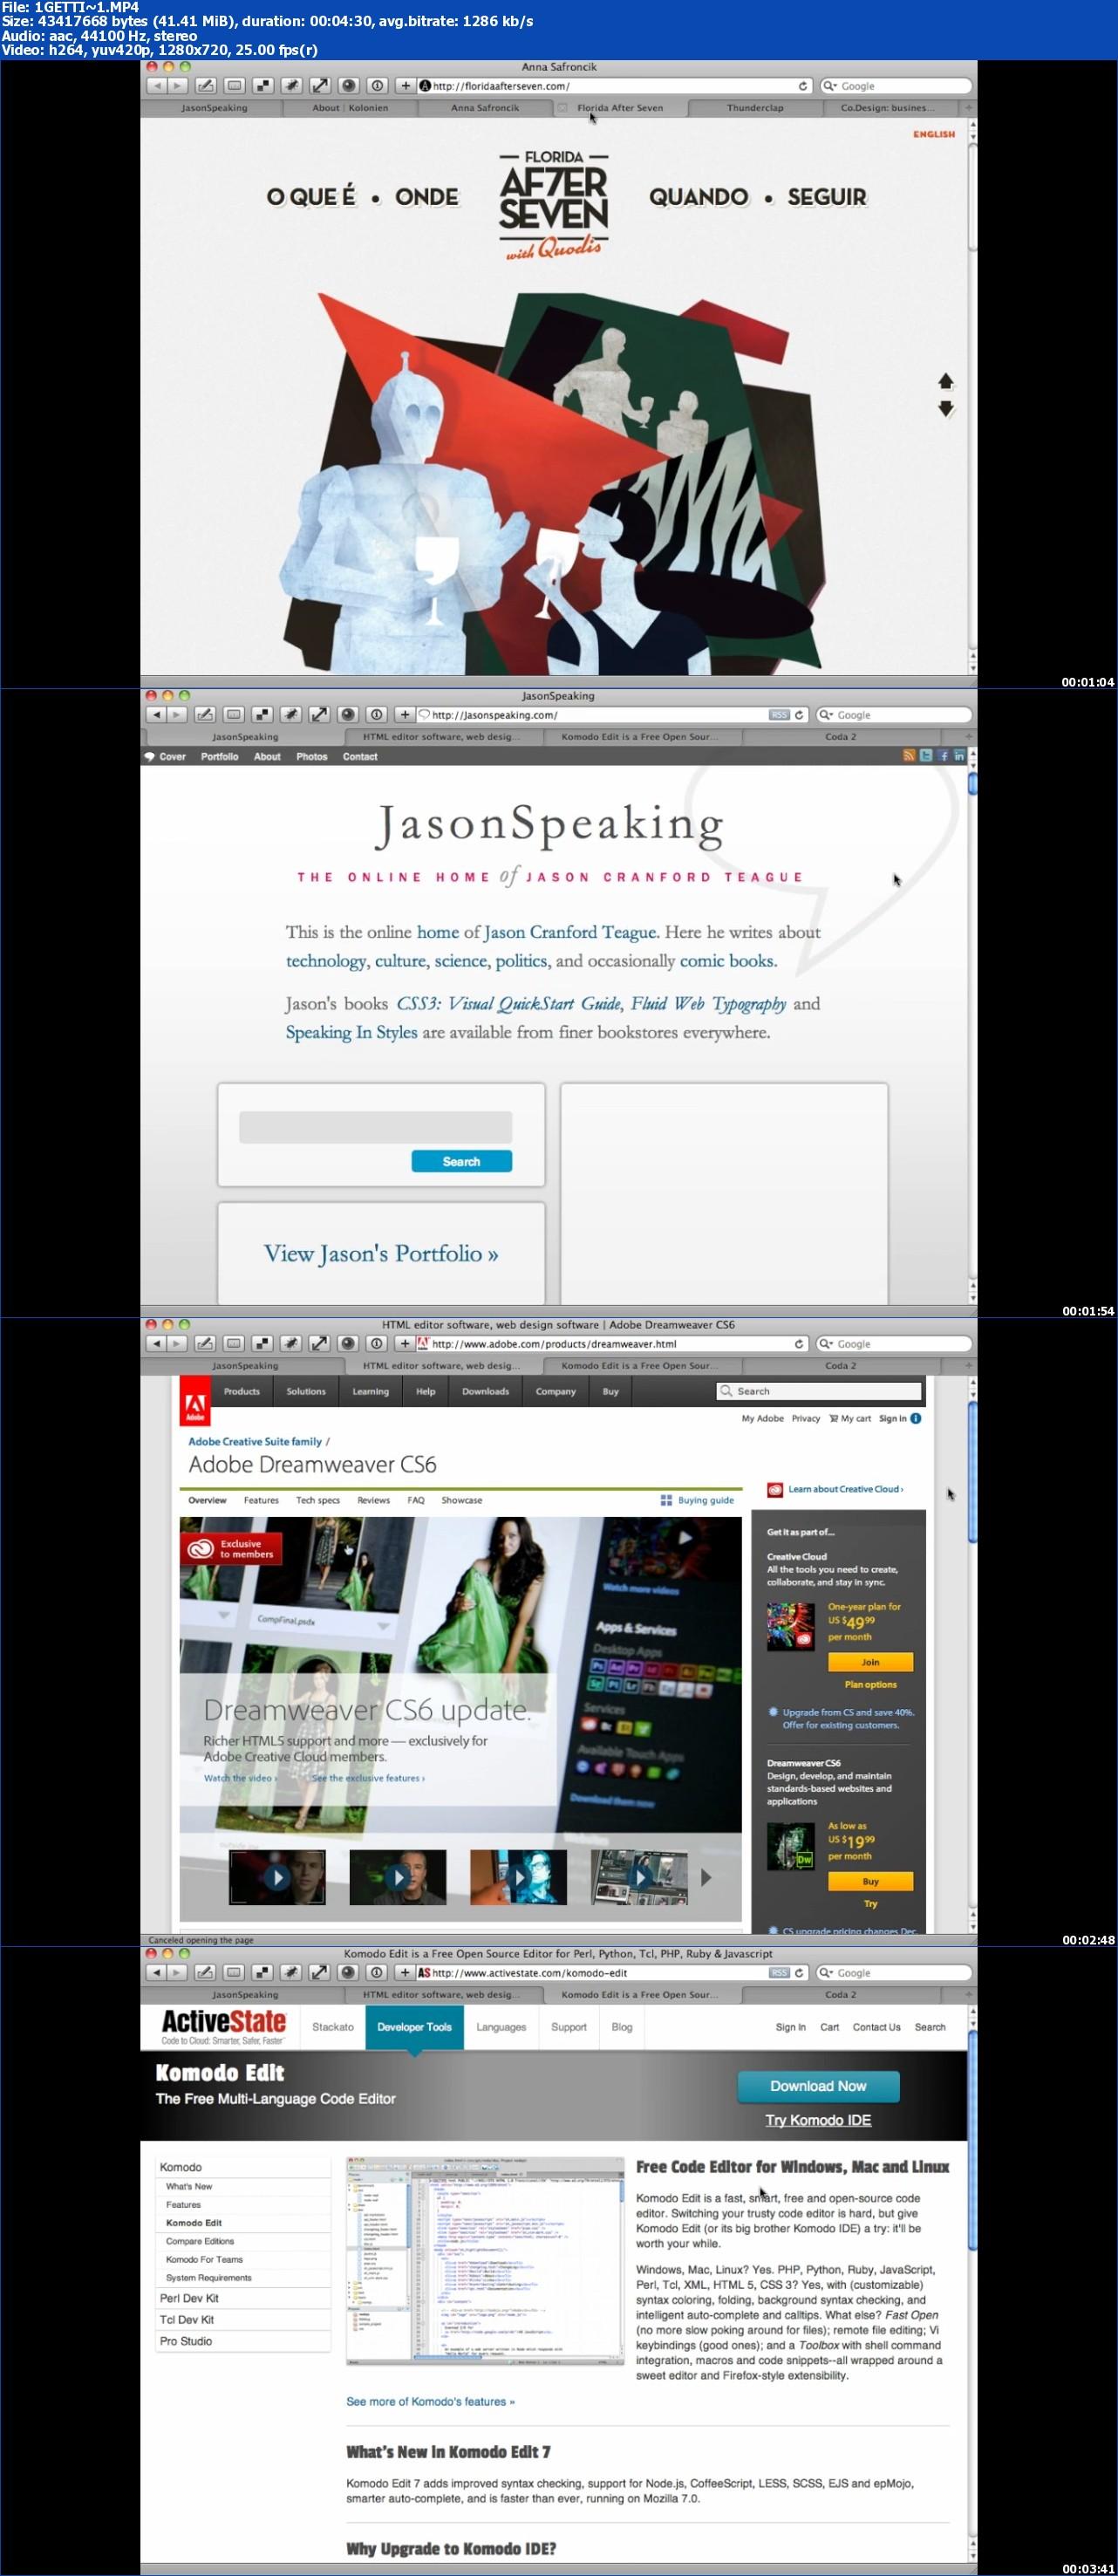 PeachpitPress - CSS3 Video QuickStart